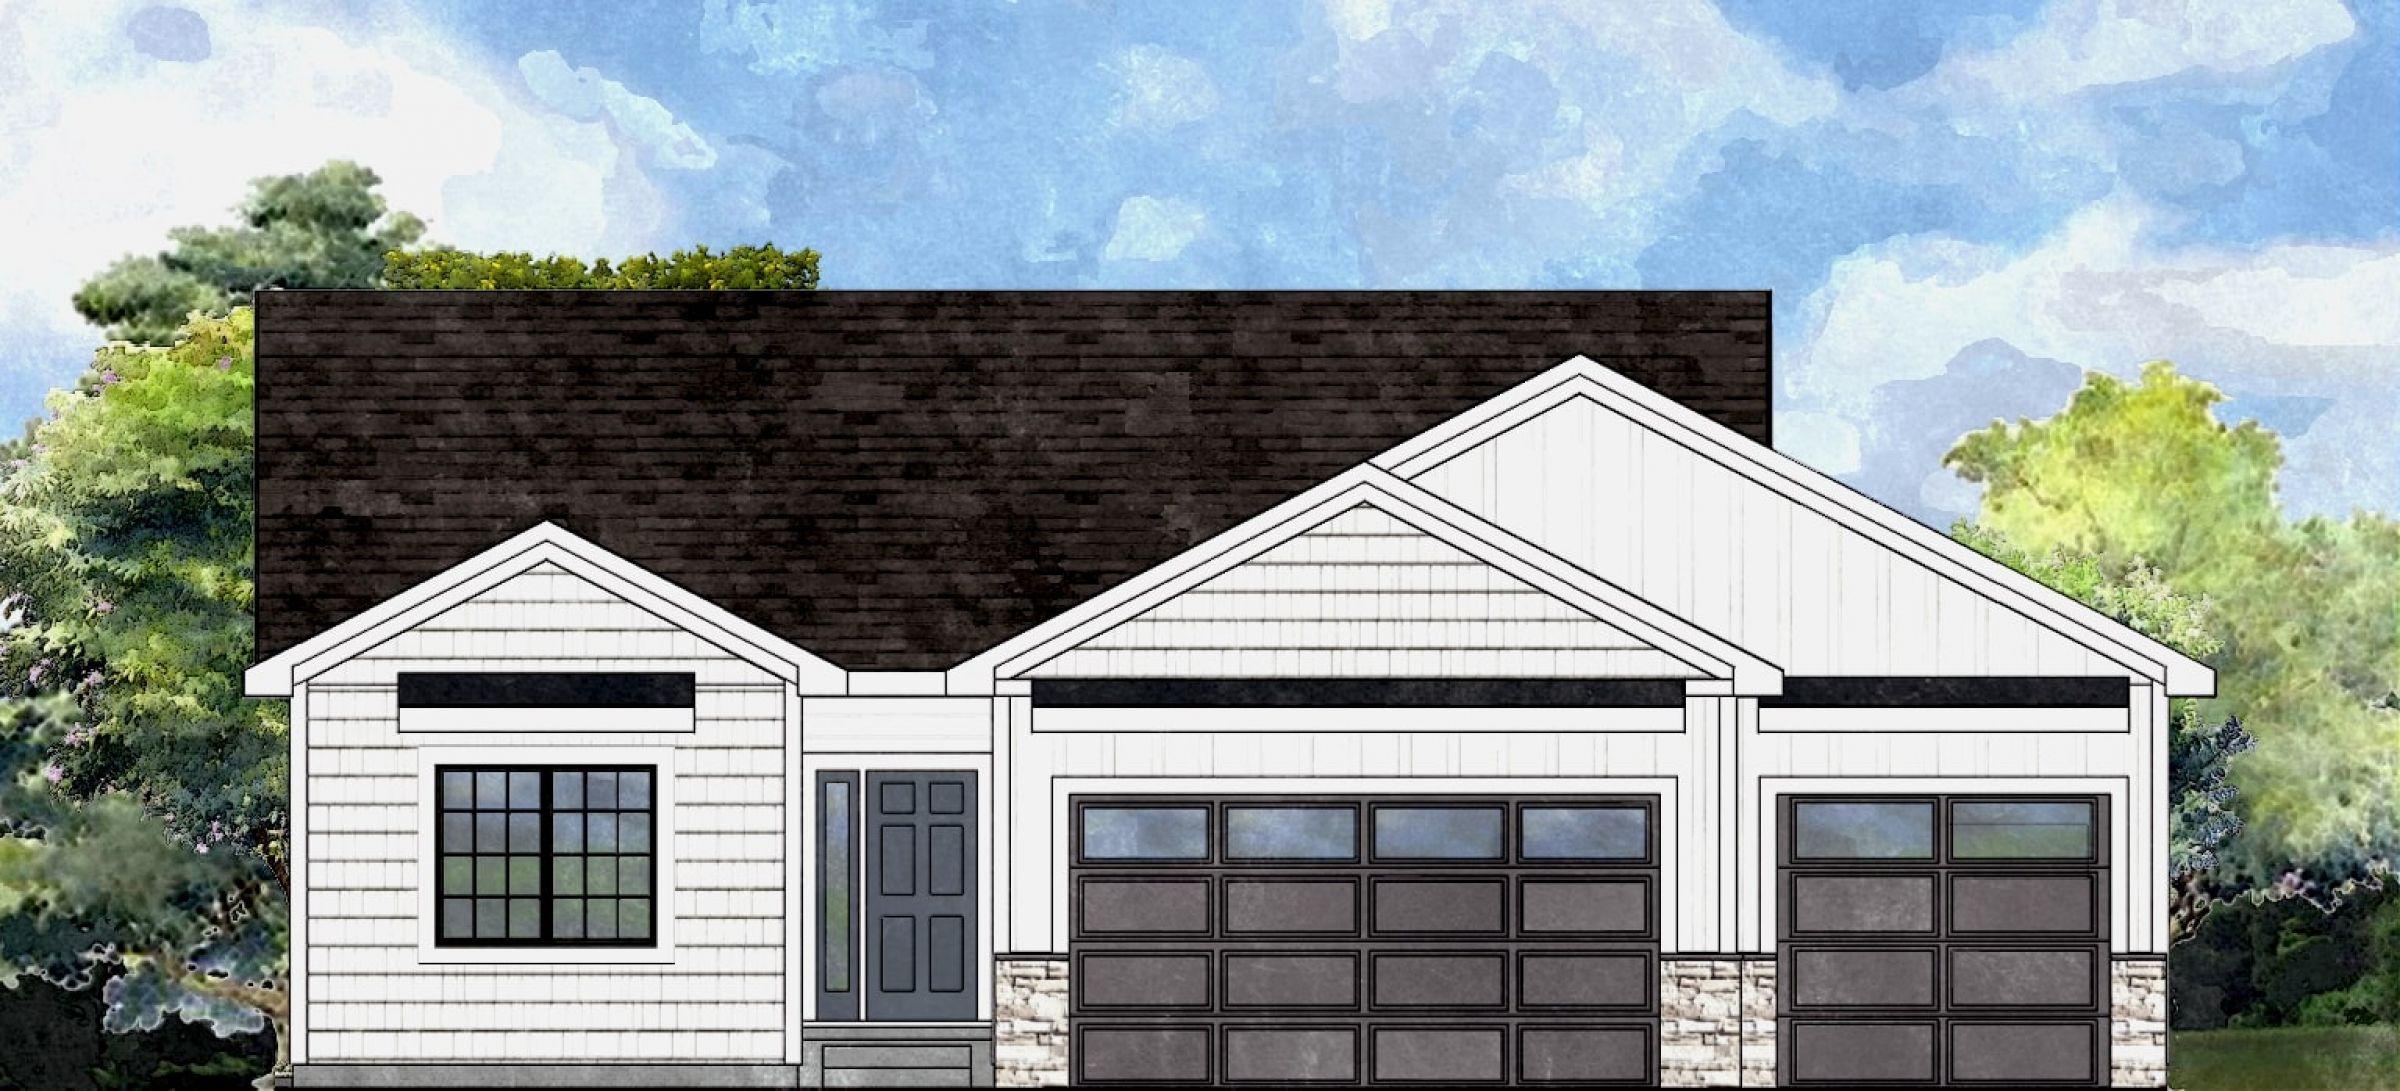 residential-warren-county-iowa-1-acres-listing-number-14995-0-2020-05-15-014739.jpg